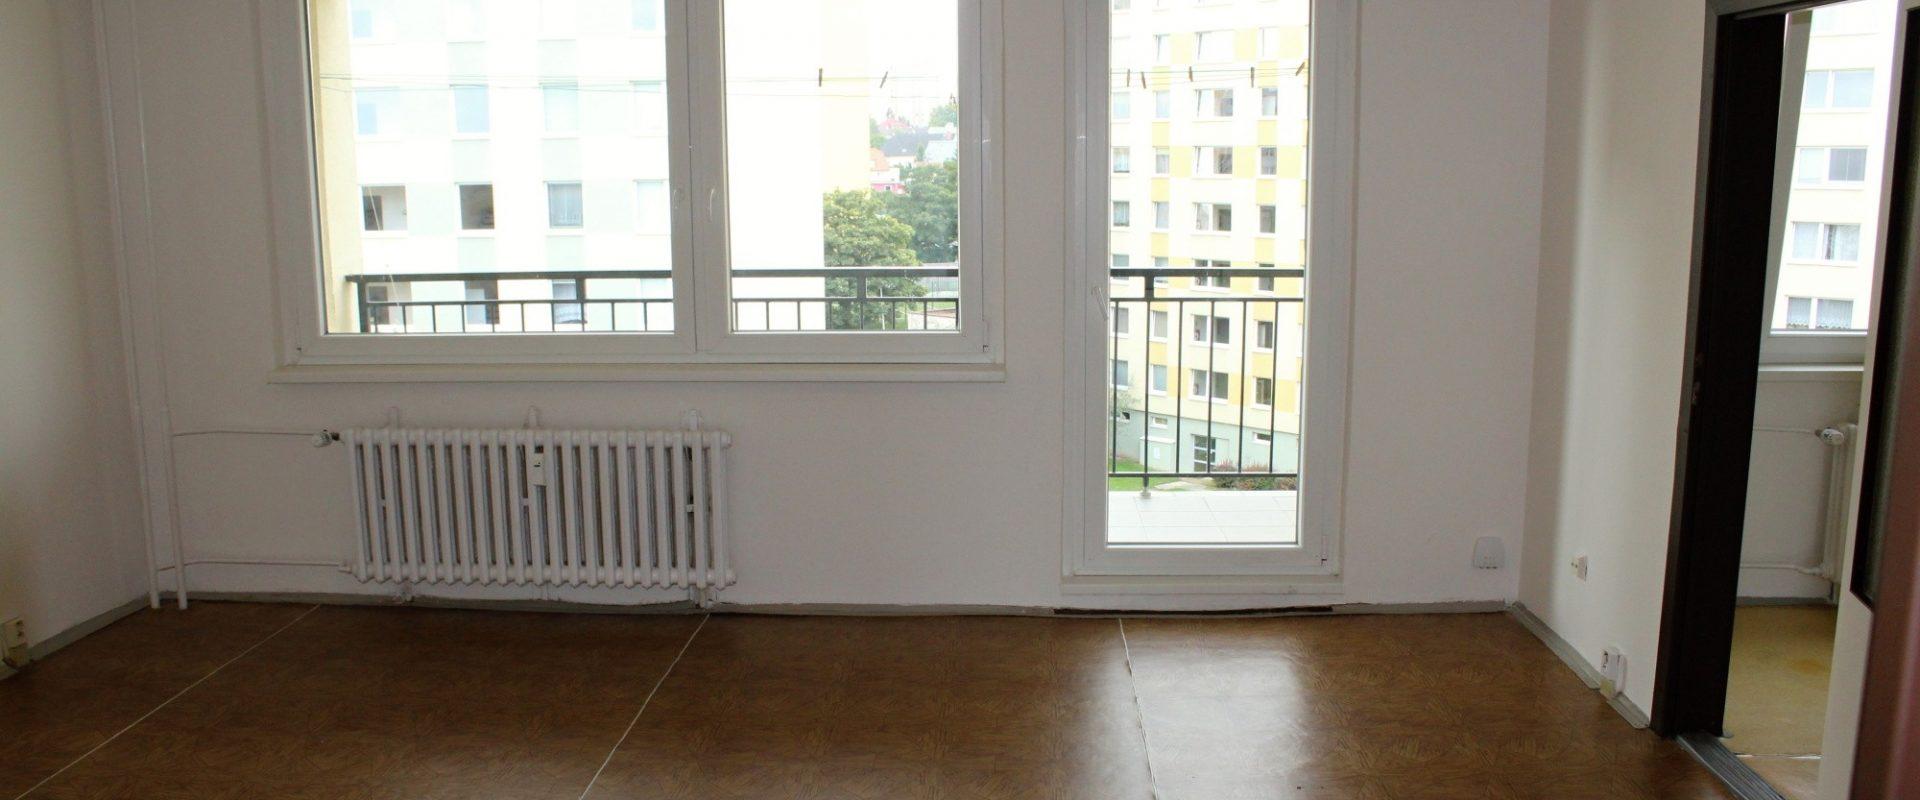 Byt 4+1, lodžie 86 m2, Praha – Háje